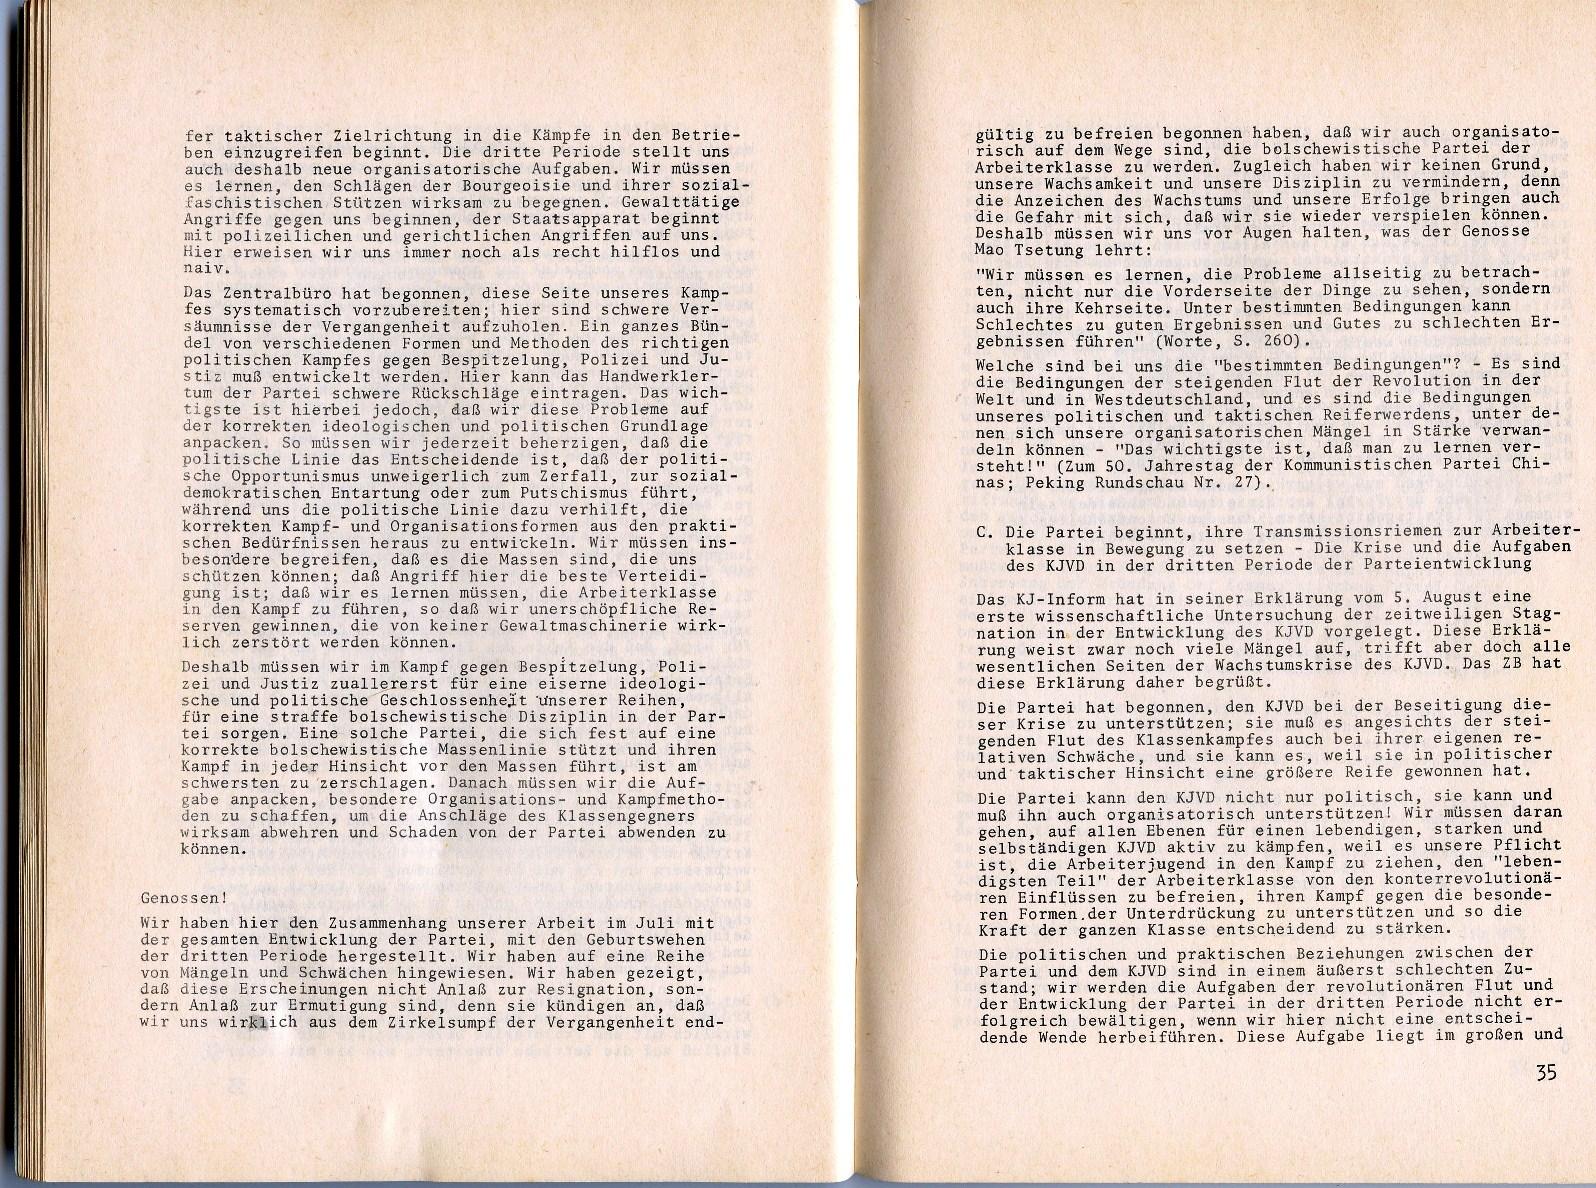 ZB_Parteiarbeiter_1971_07_19